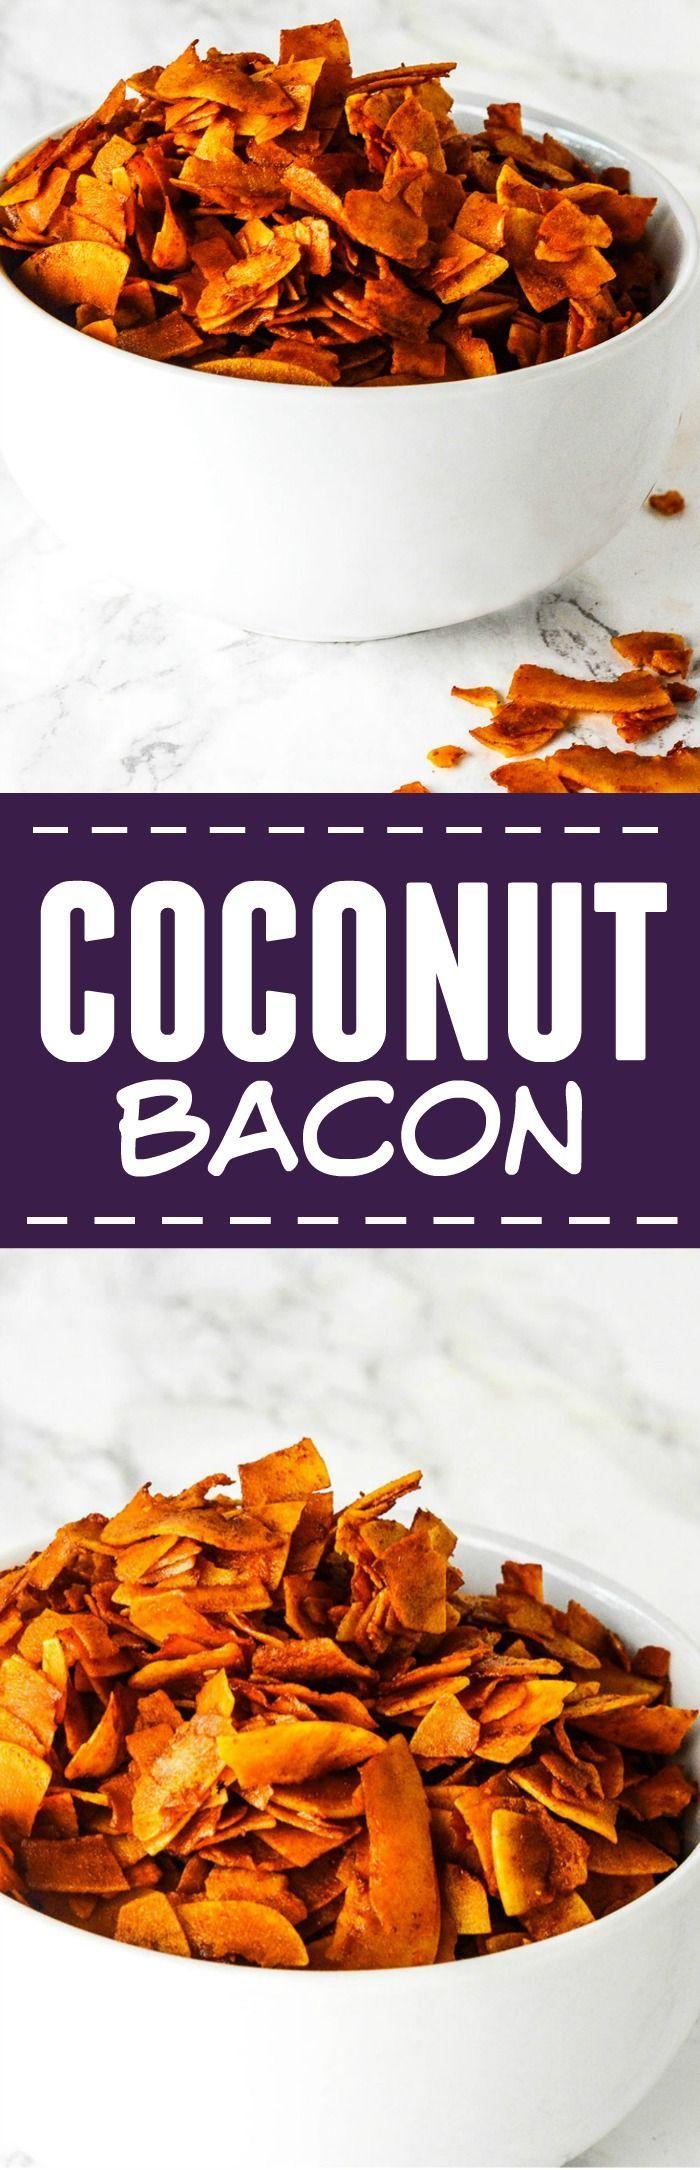 Coconut Bacon (vegan, glutenfree) Easy to prepare, use instead of bacon #vegan #glutenfree